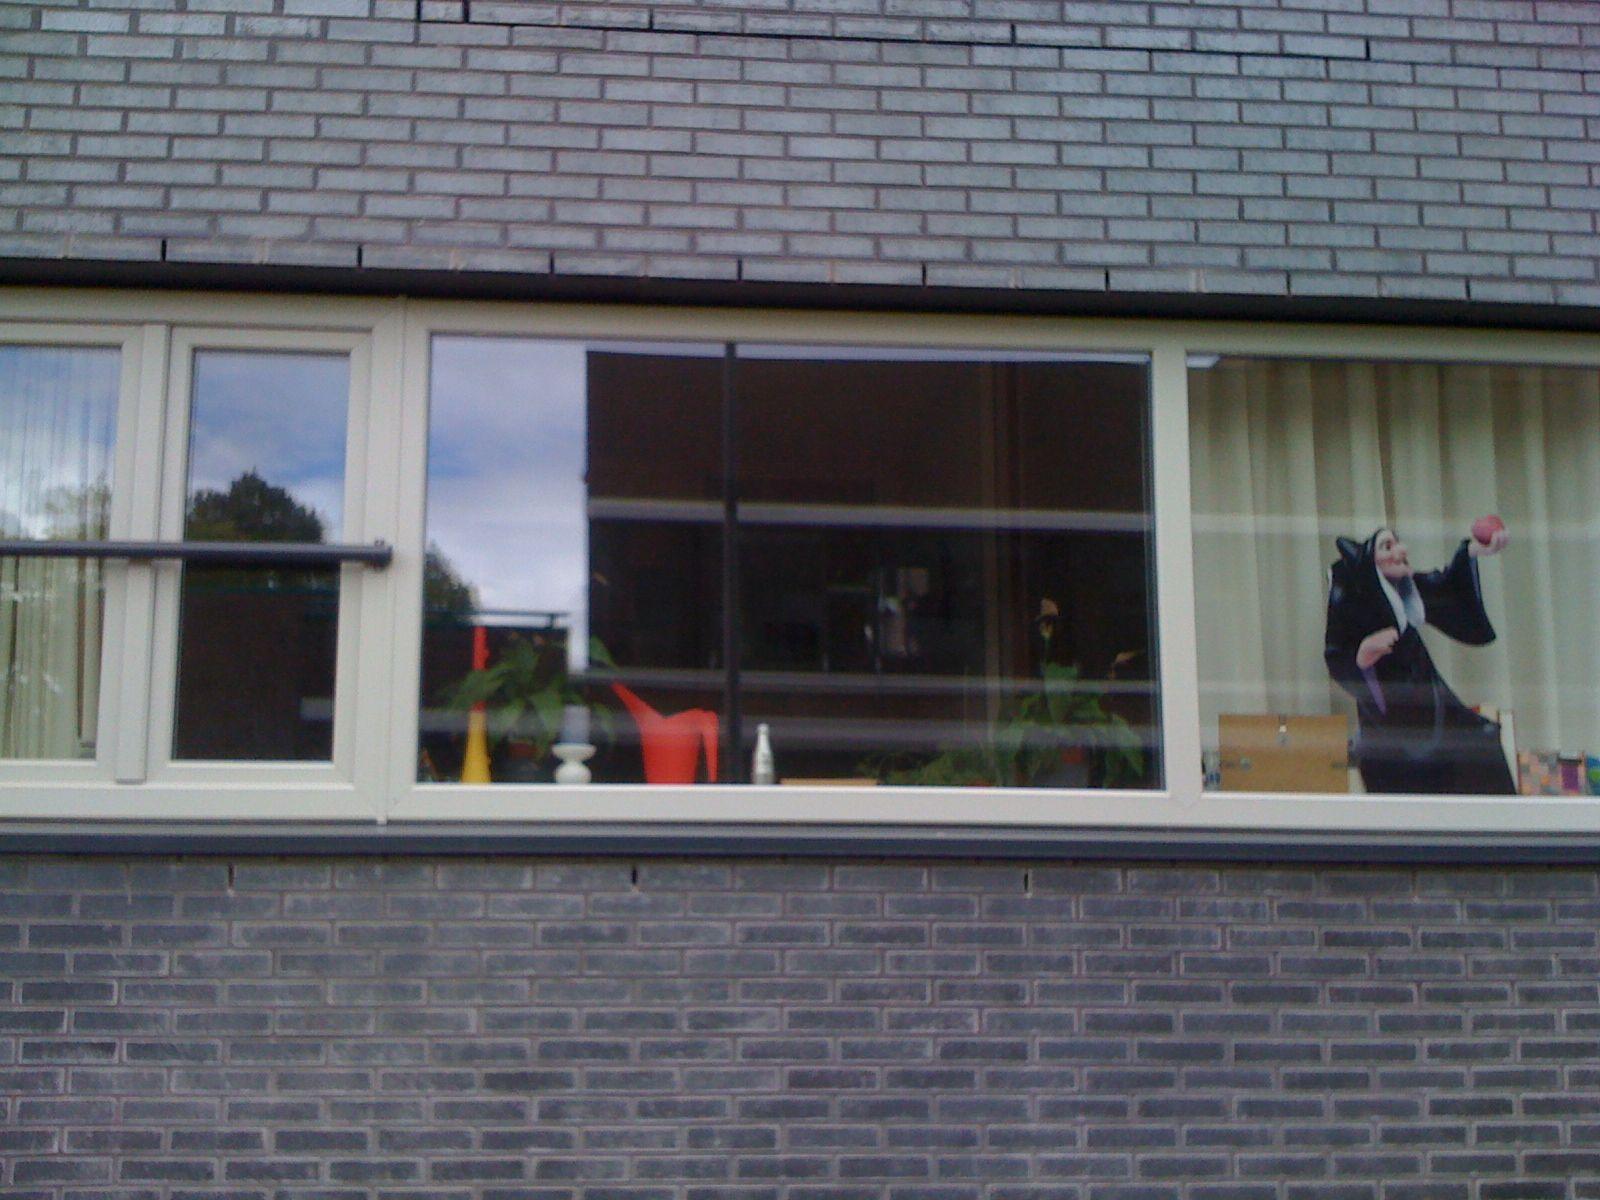 Ikea-gieter in studentenflat (Nijmegen)